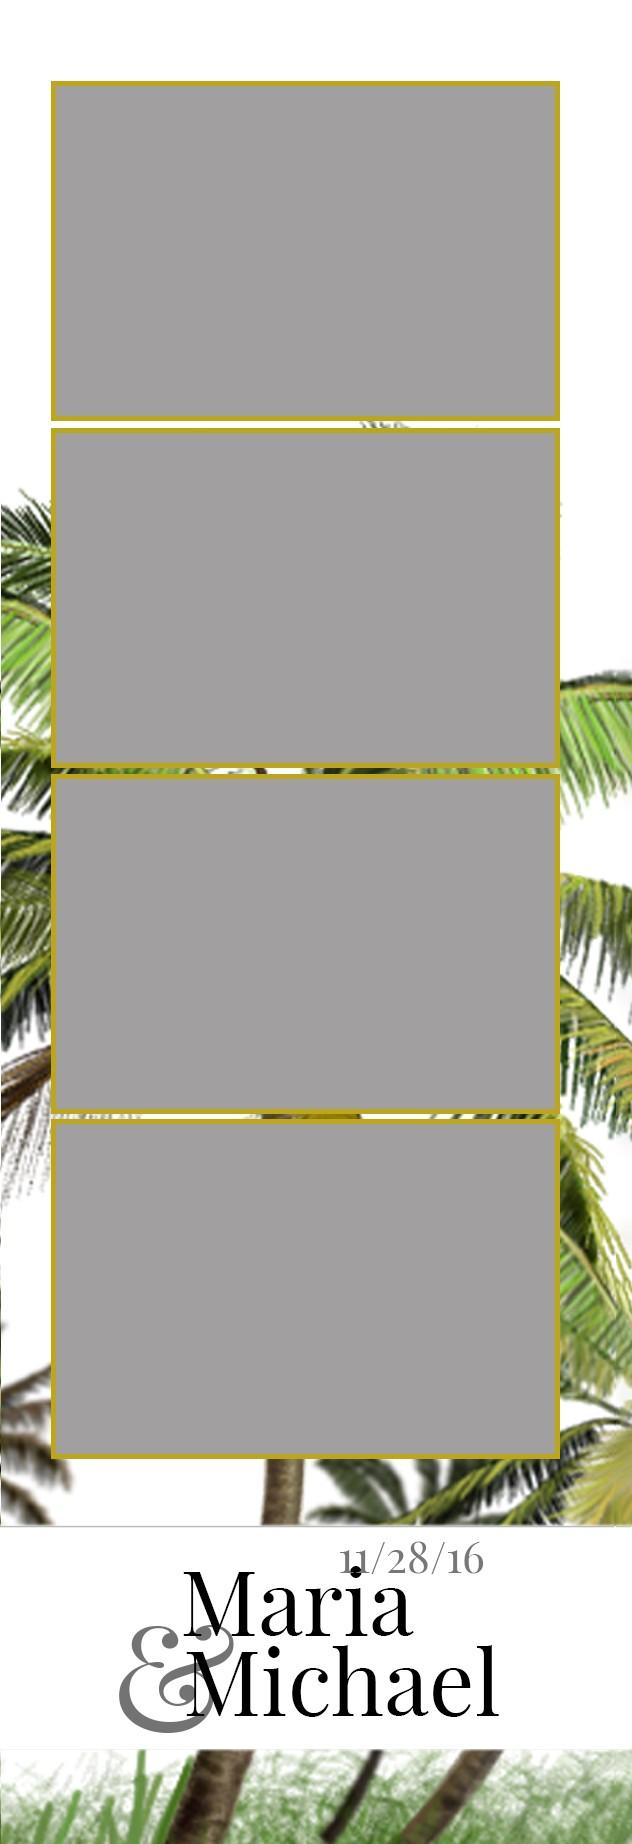 Breezy palms